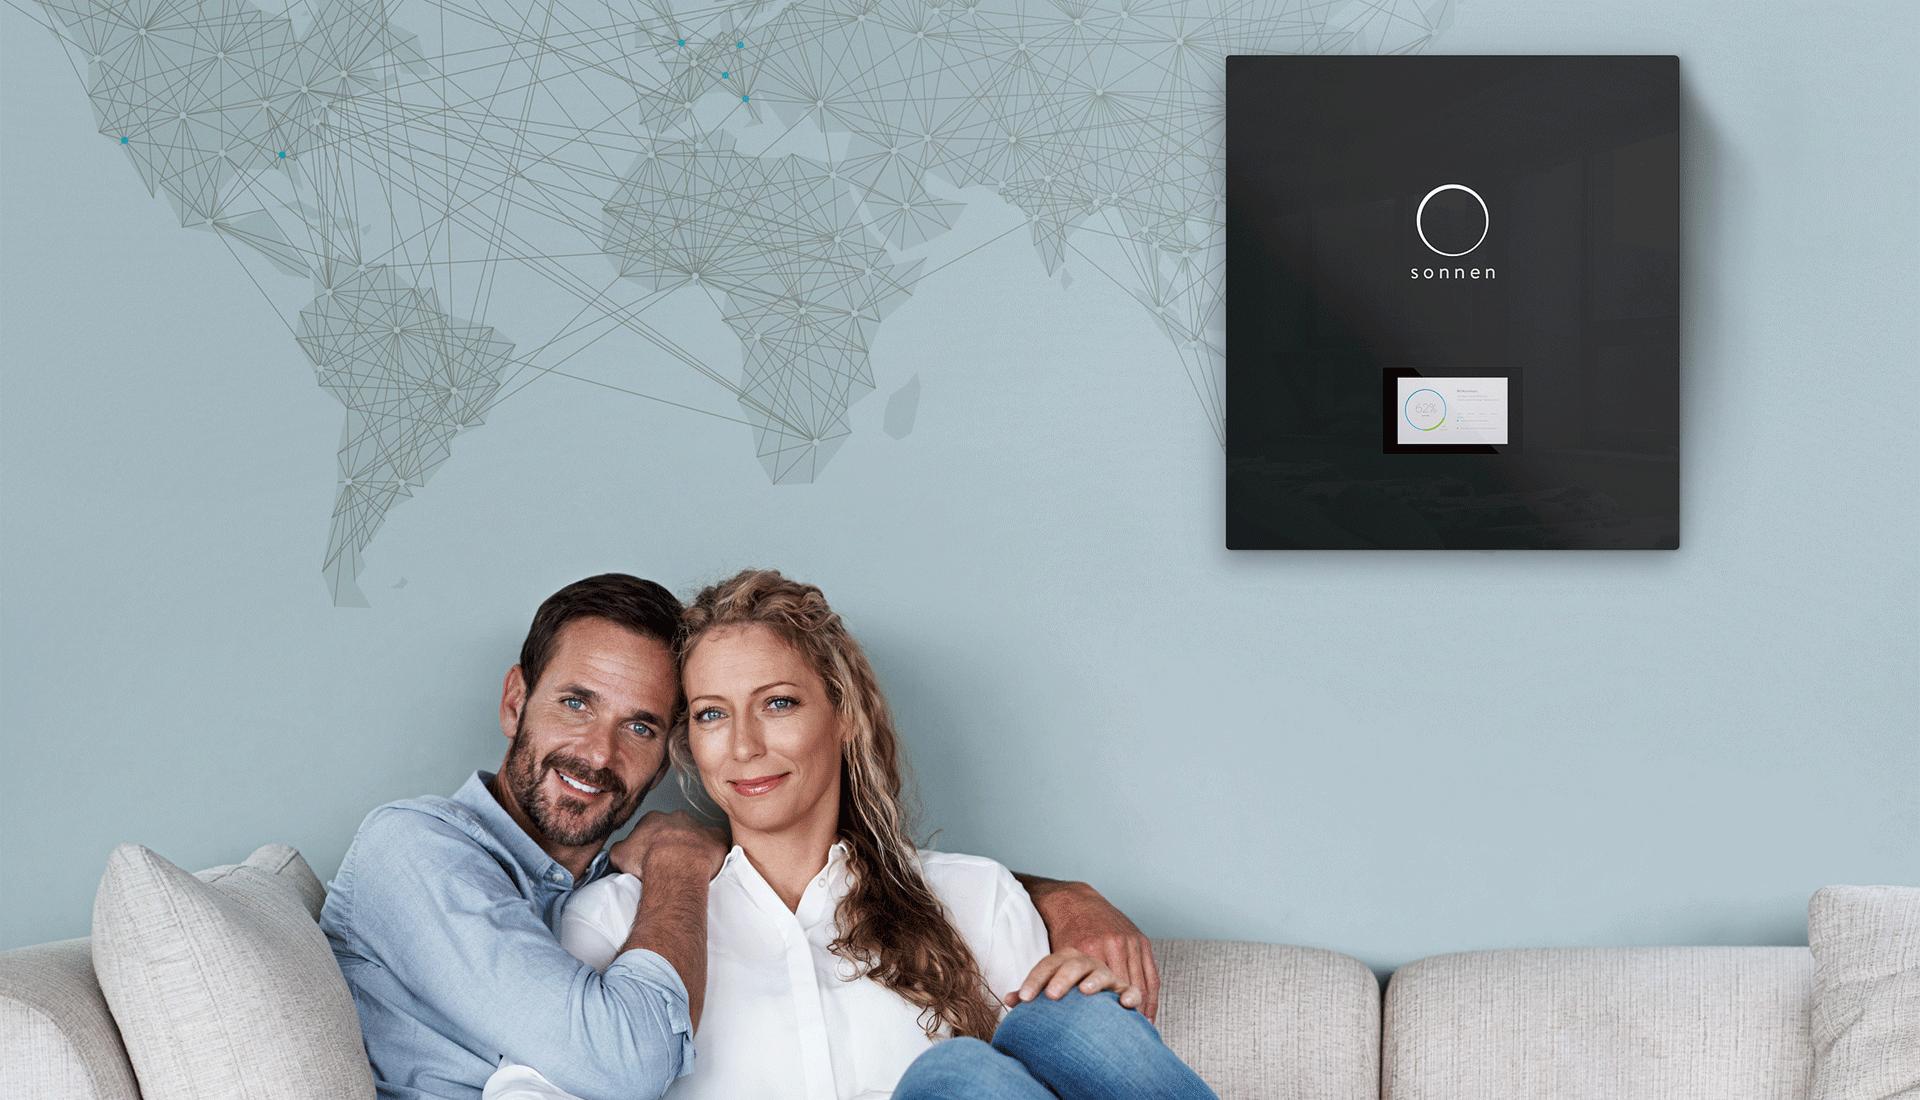 Image sonnen GmbH